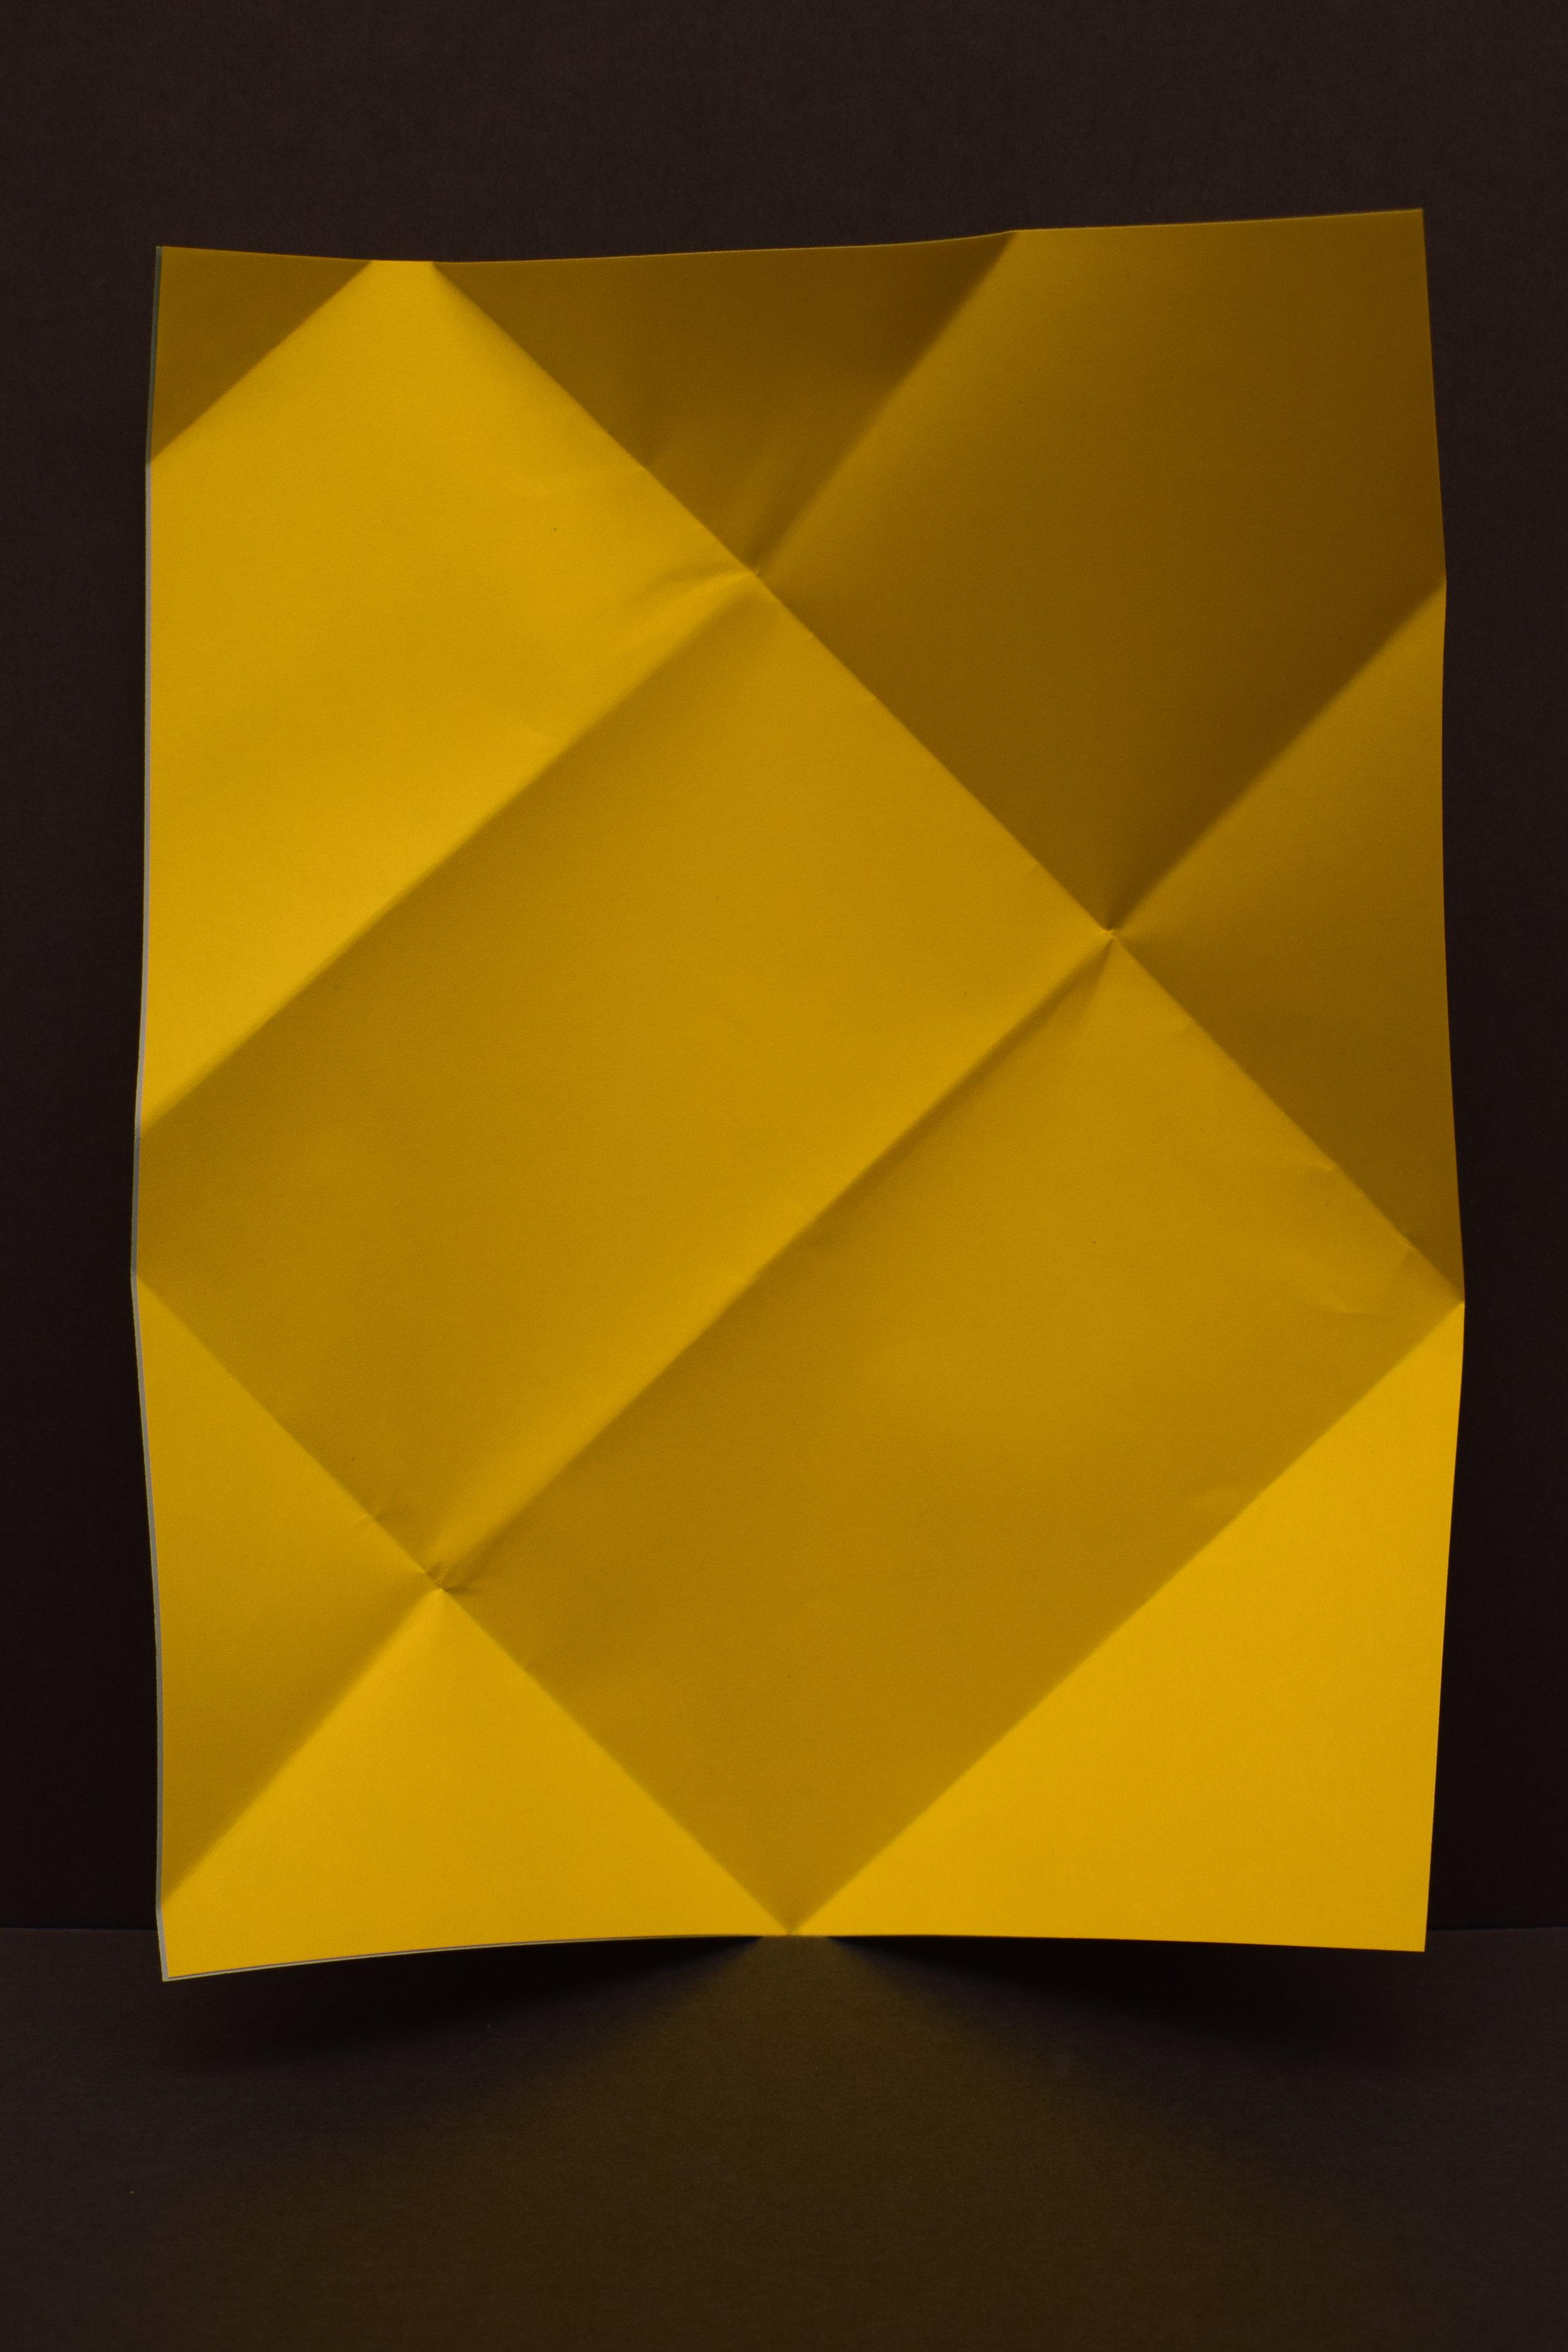 Polish_letter_crease_pattern_DSC_0553.JPG